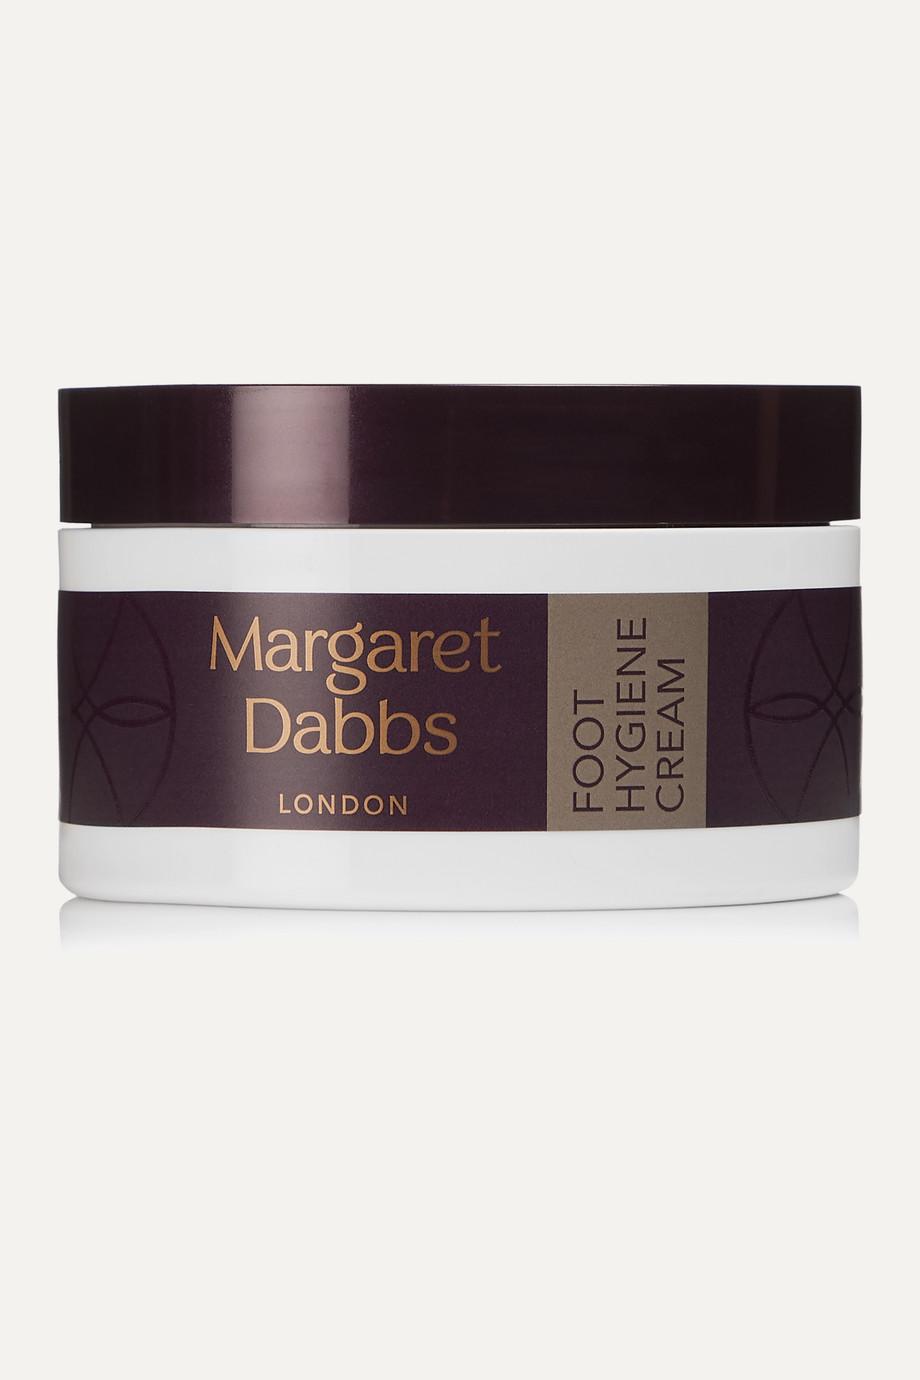 Margaret Dabbs London Foot Hygiene Cream, 100 g – Fußcreme